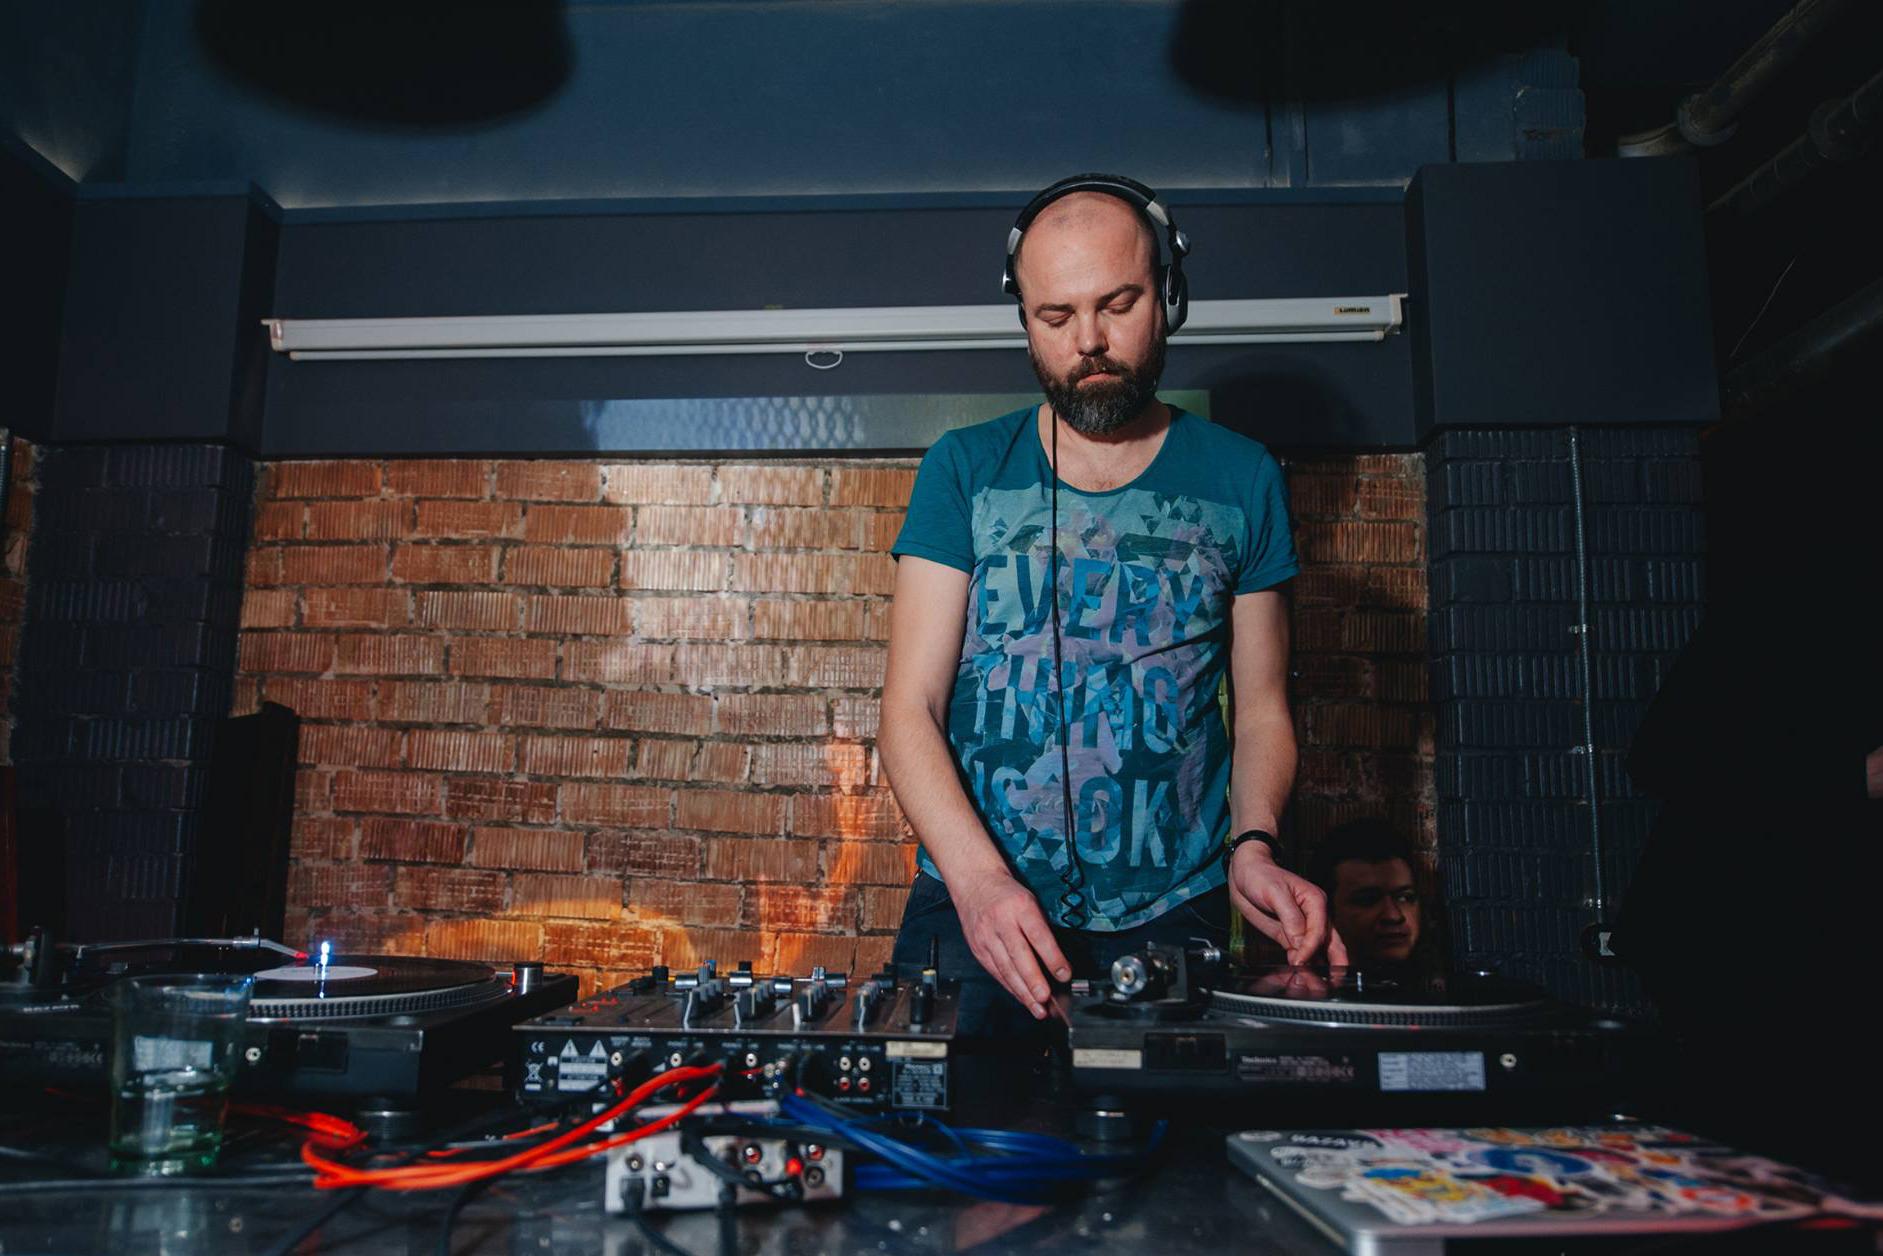 Алексей Кутузов, фото: nightlab.by